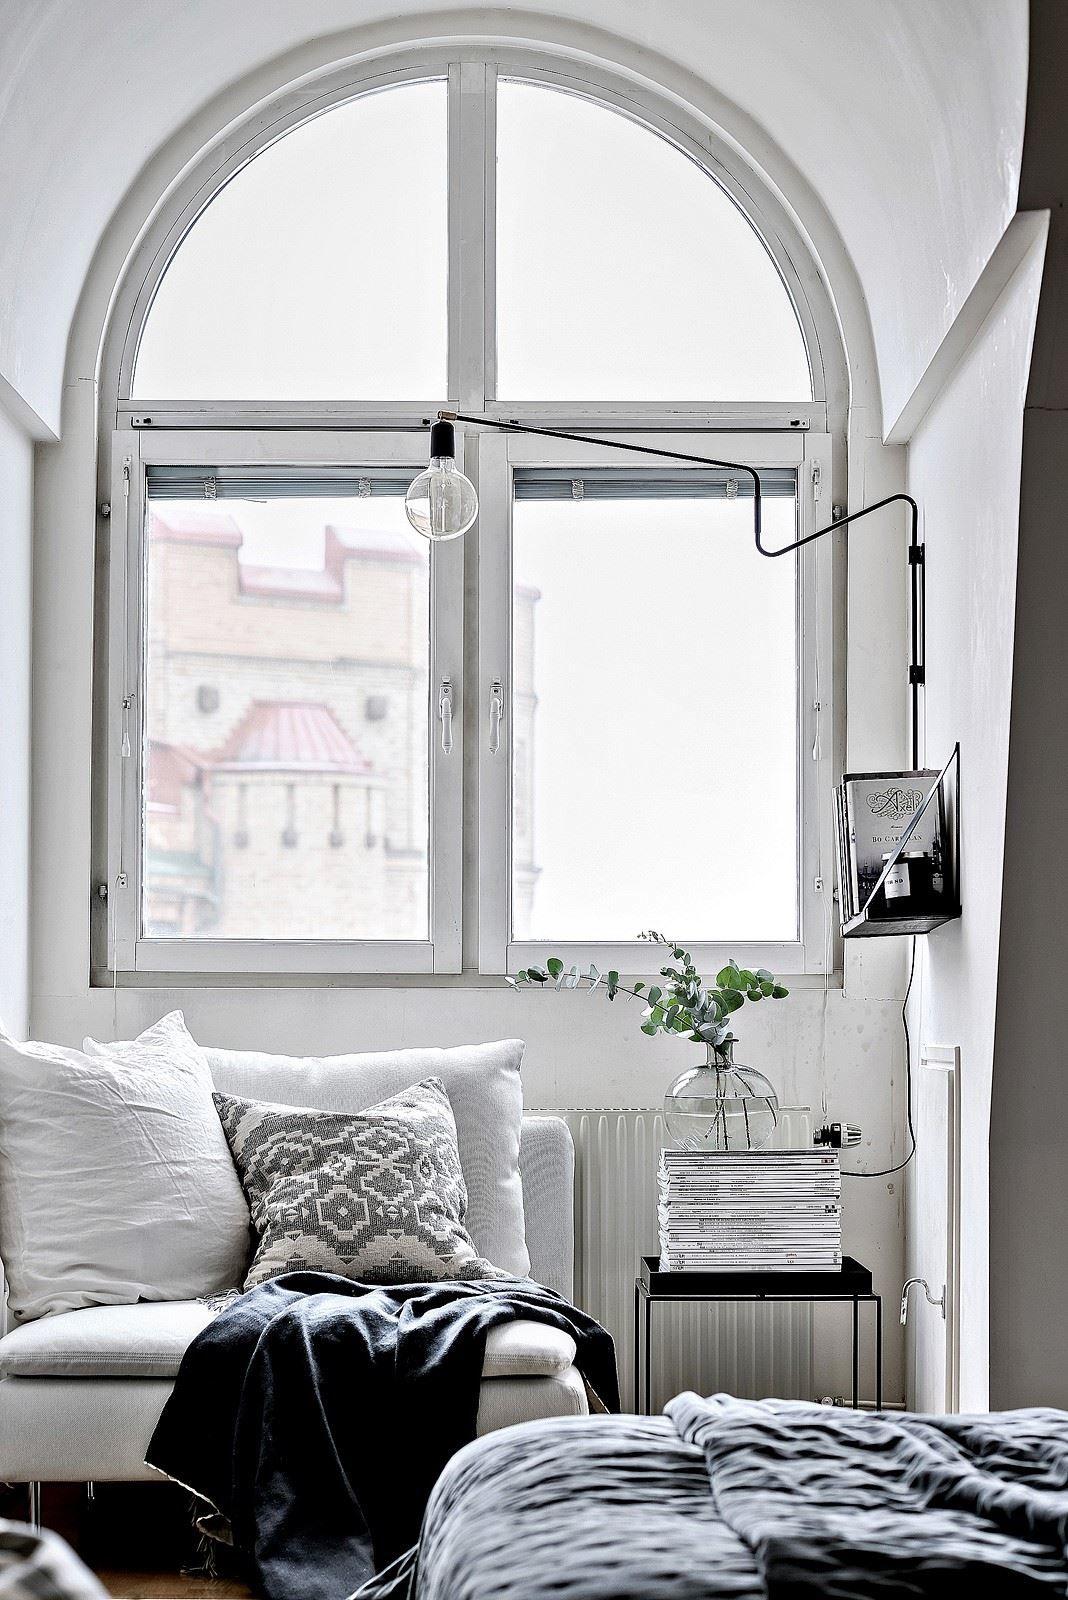 Attic Studio Apartment Follow Gravity Home Blog